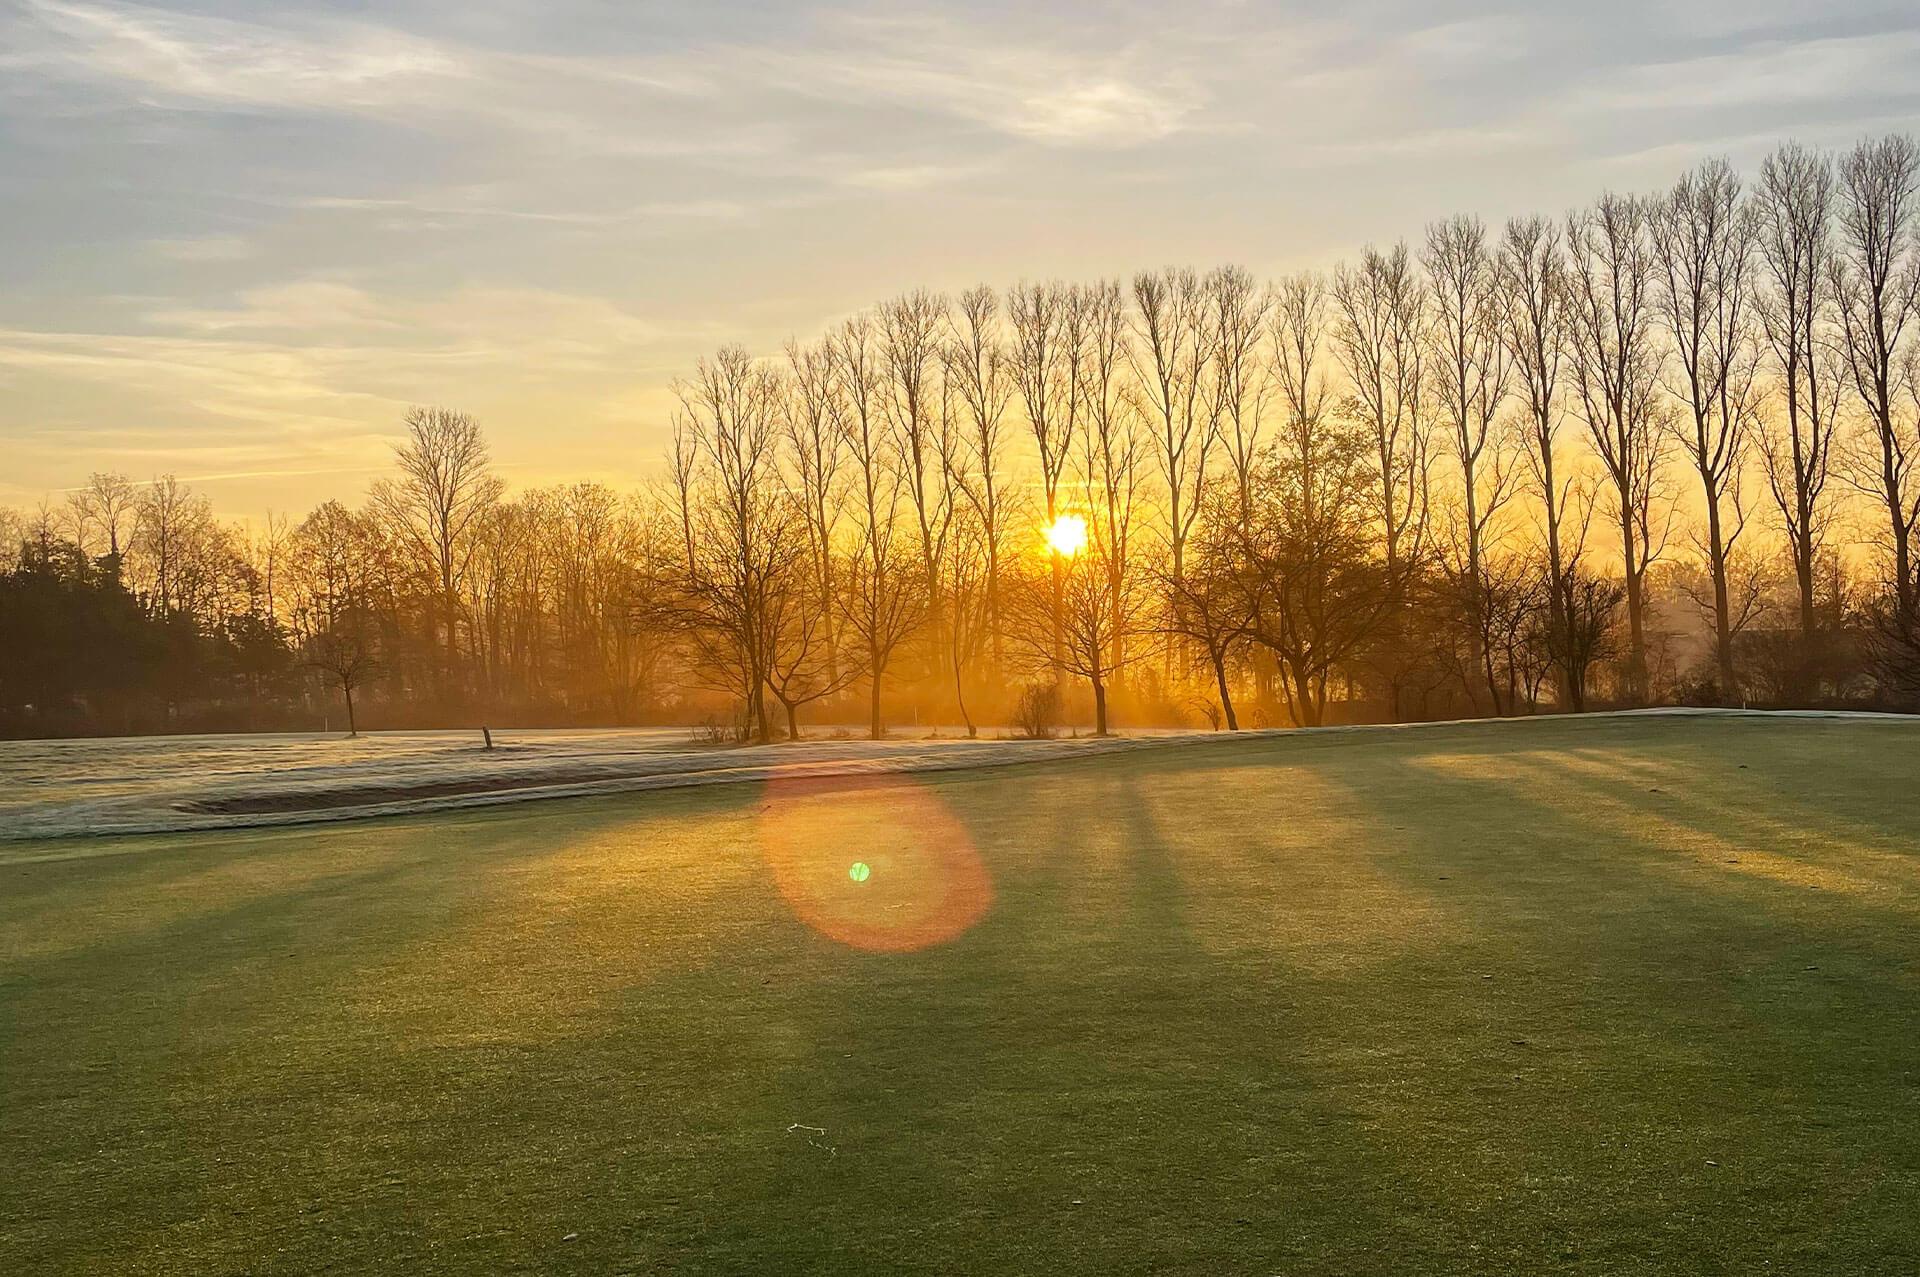 https://golfclub-peckeloh.de/wp-content/uploads/2021/02/Galeriebilder_1920_x_1277px-3.jpg